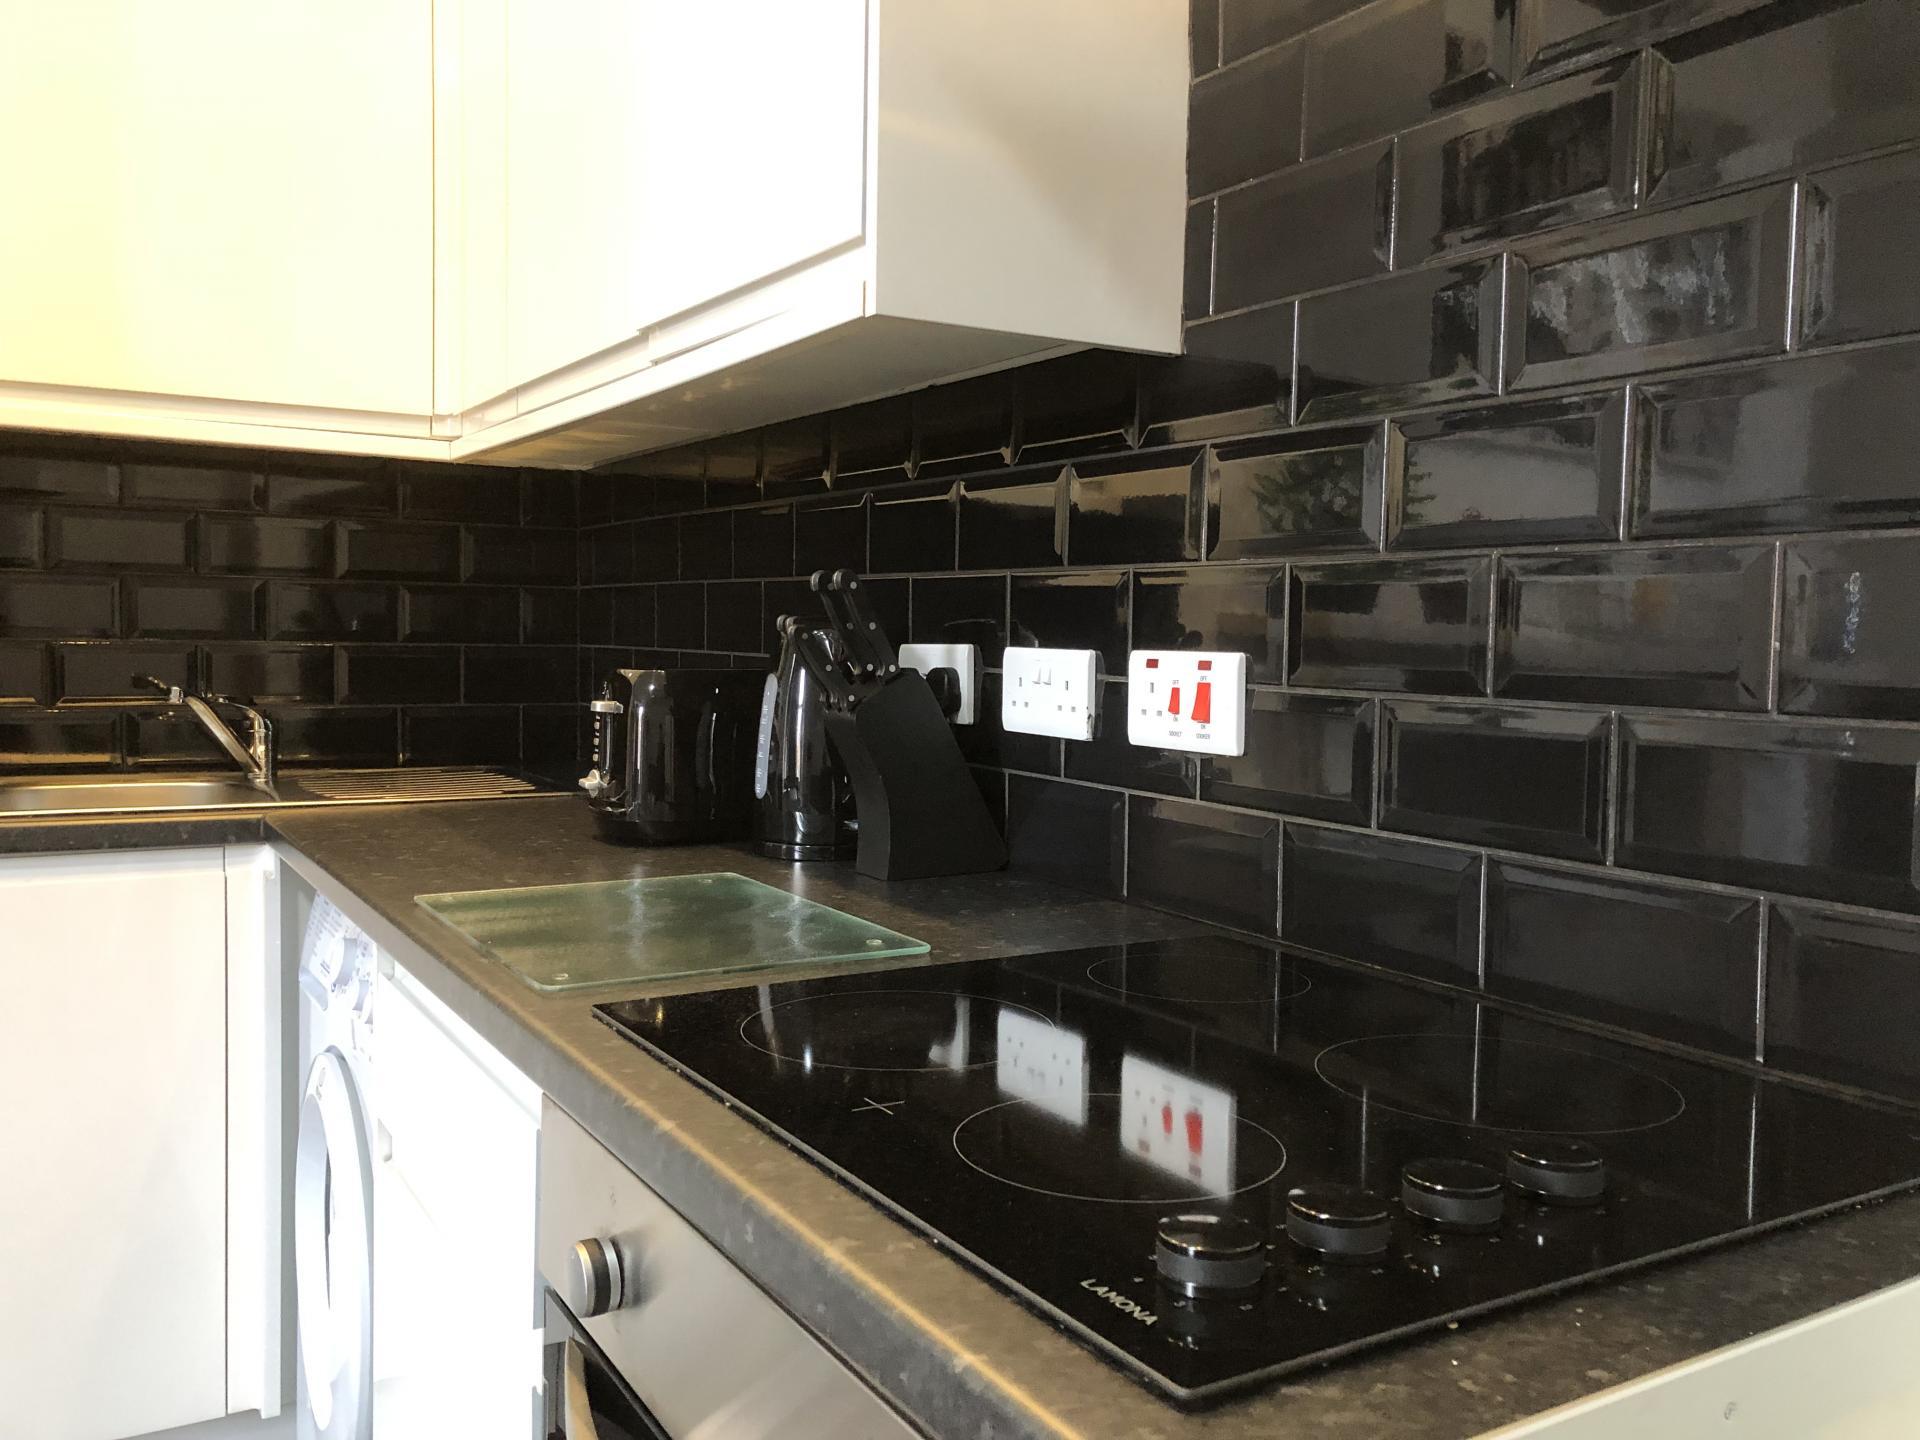 Kitchen facilities at Fishergate Apartment